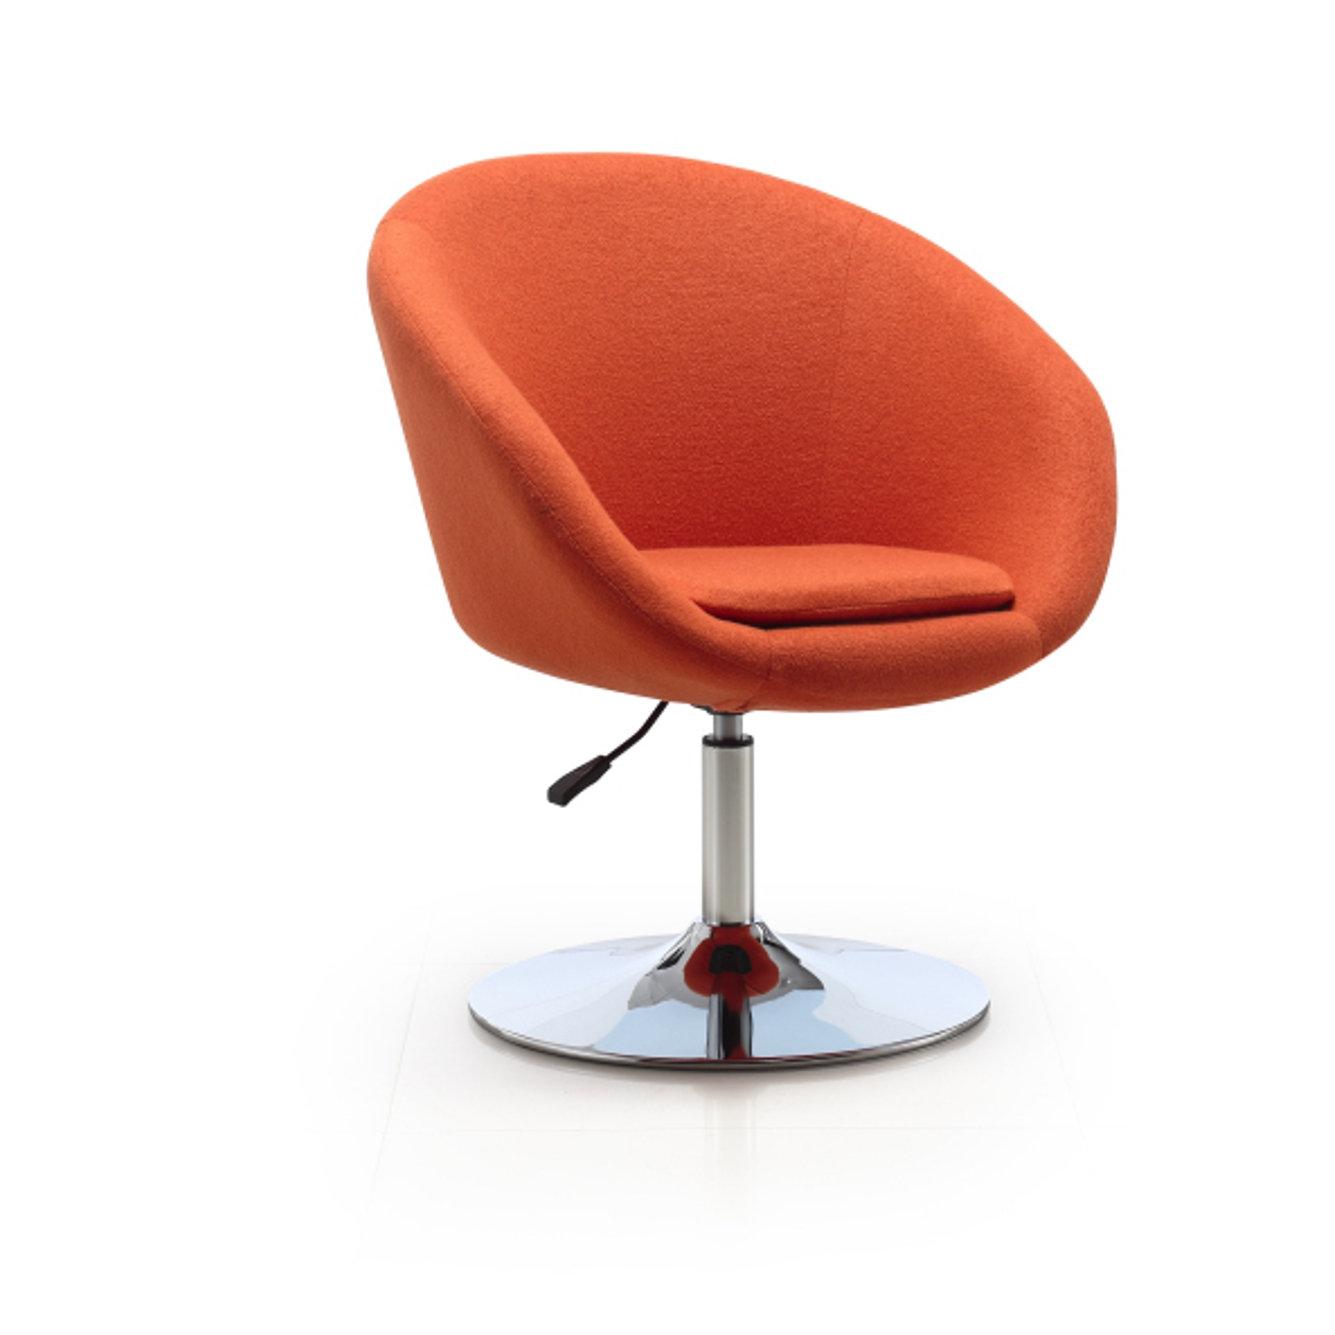 Orren Ellis Helmuth Swivel Barrel Chair & Reviews | Wayfair